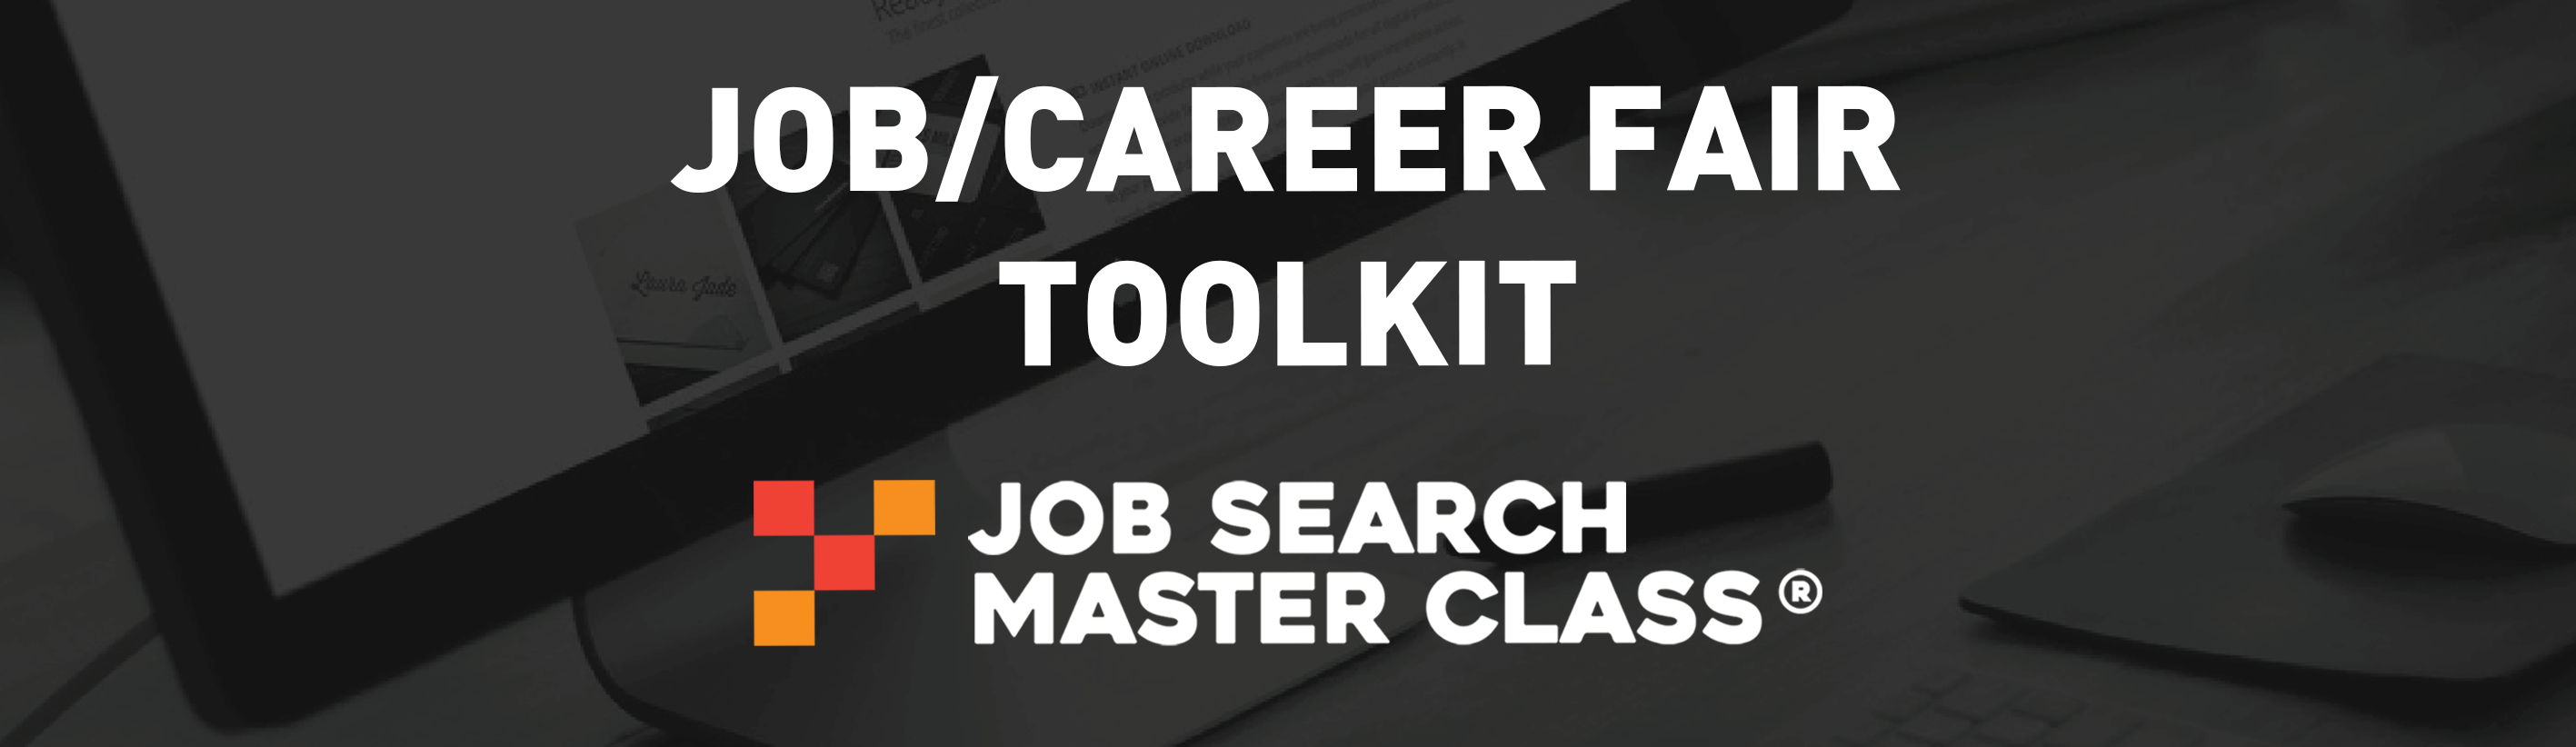 Job Career Fair Toolkit